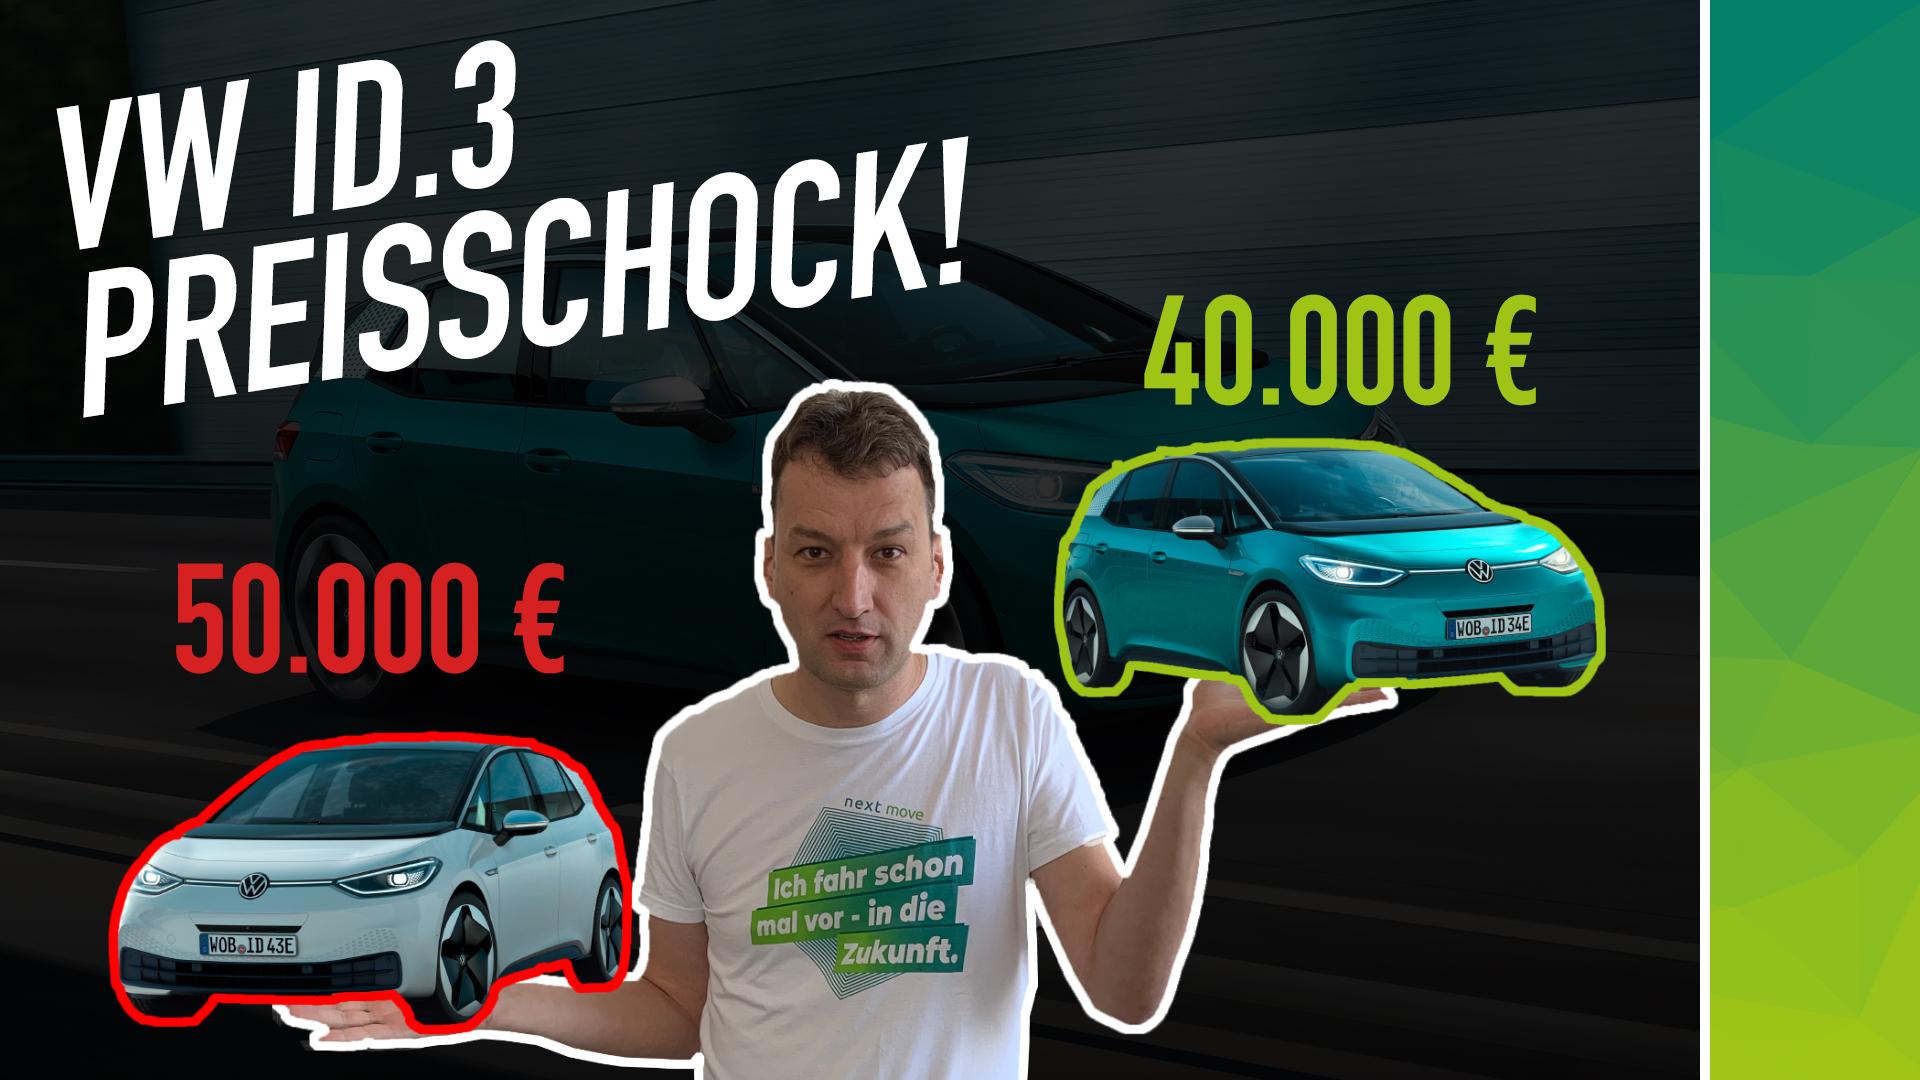 VW ID3 Preise und Konfiguration nextmove Preisschock Elektroauto